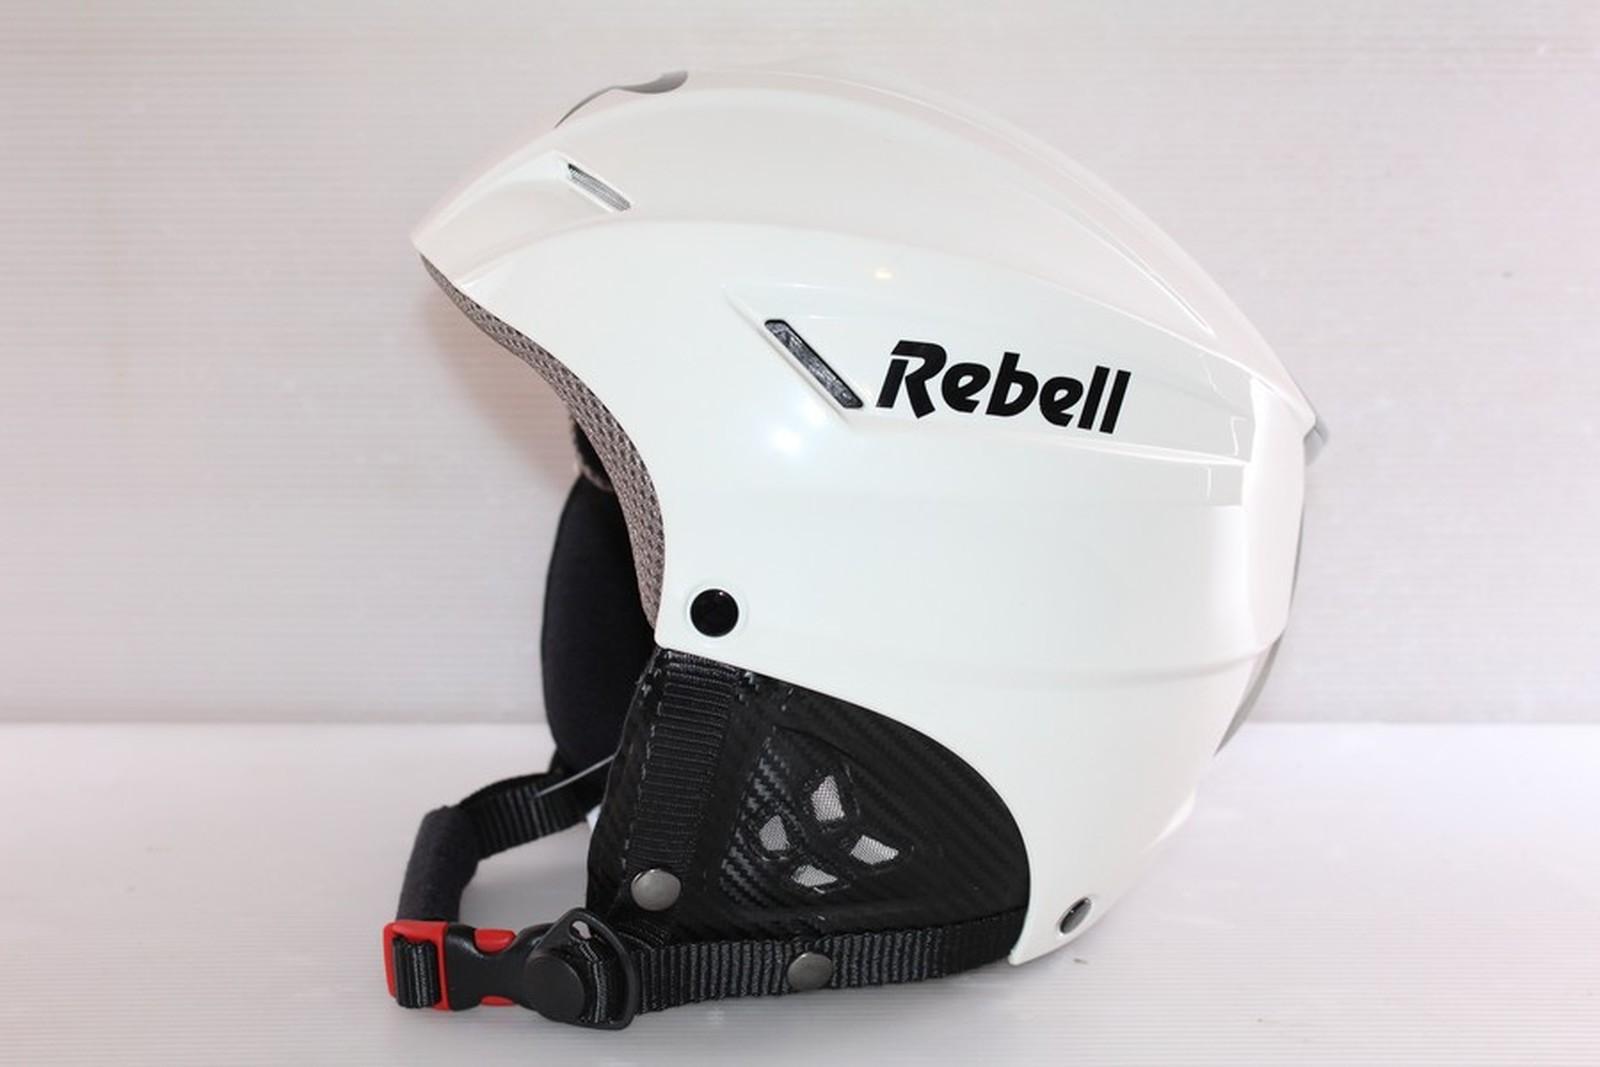 Dámská lyžařská helma Rebell Rebell vel. 61